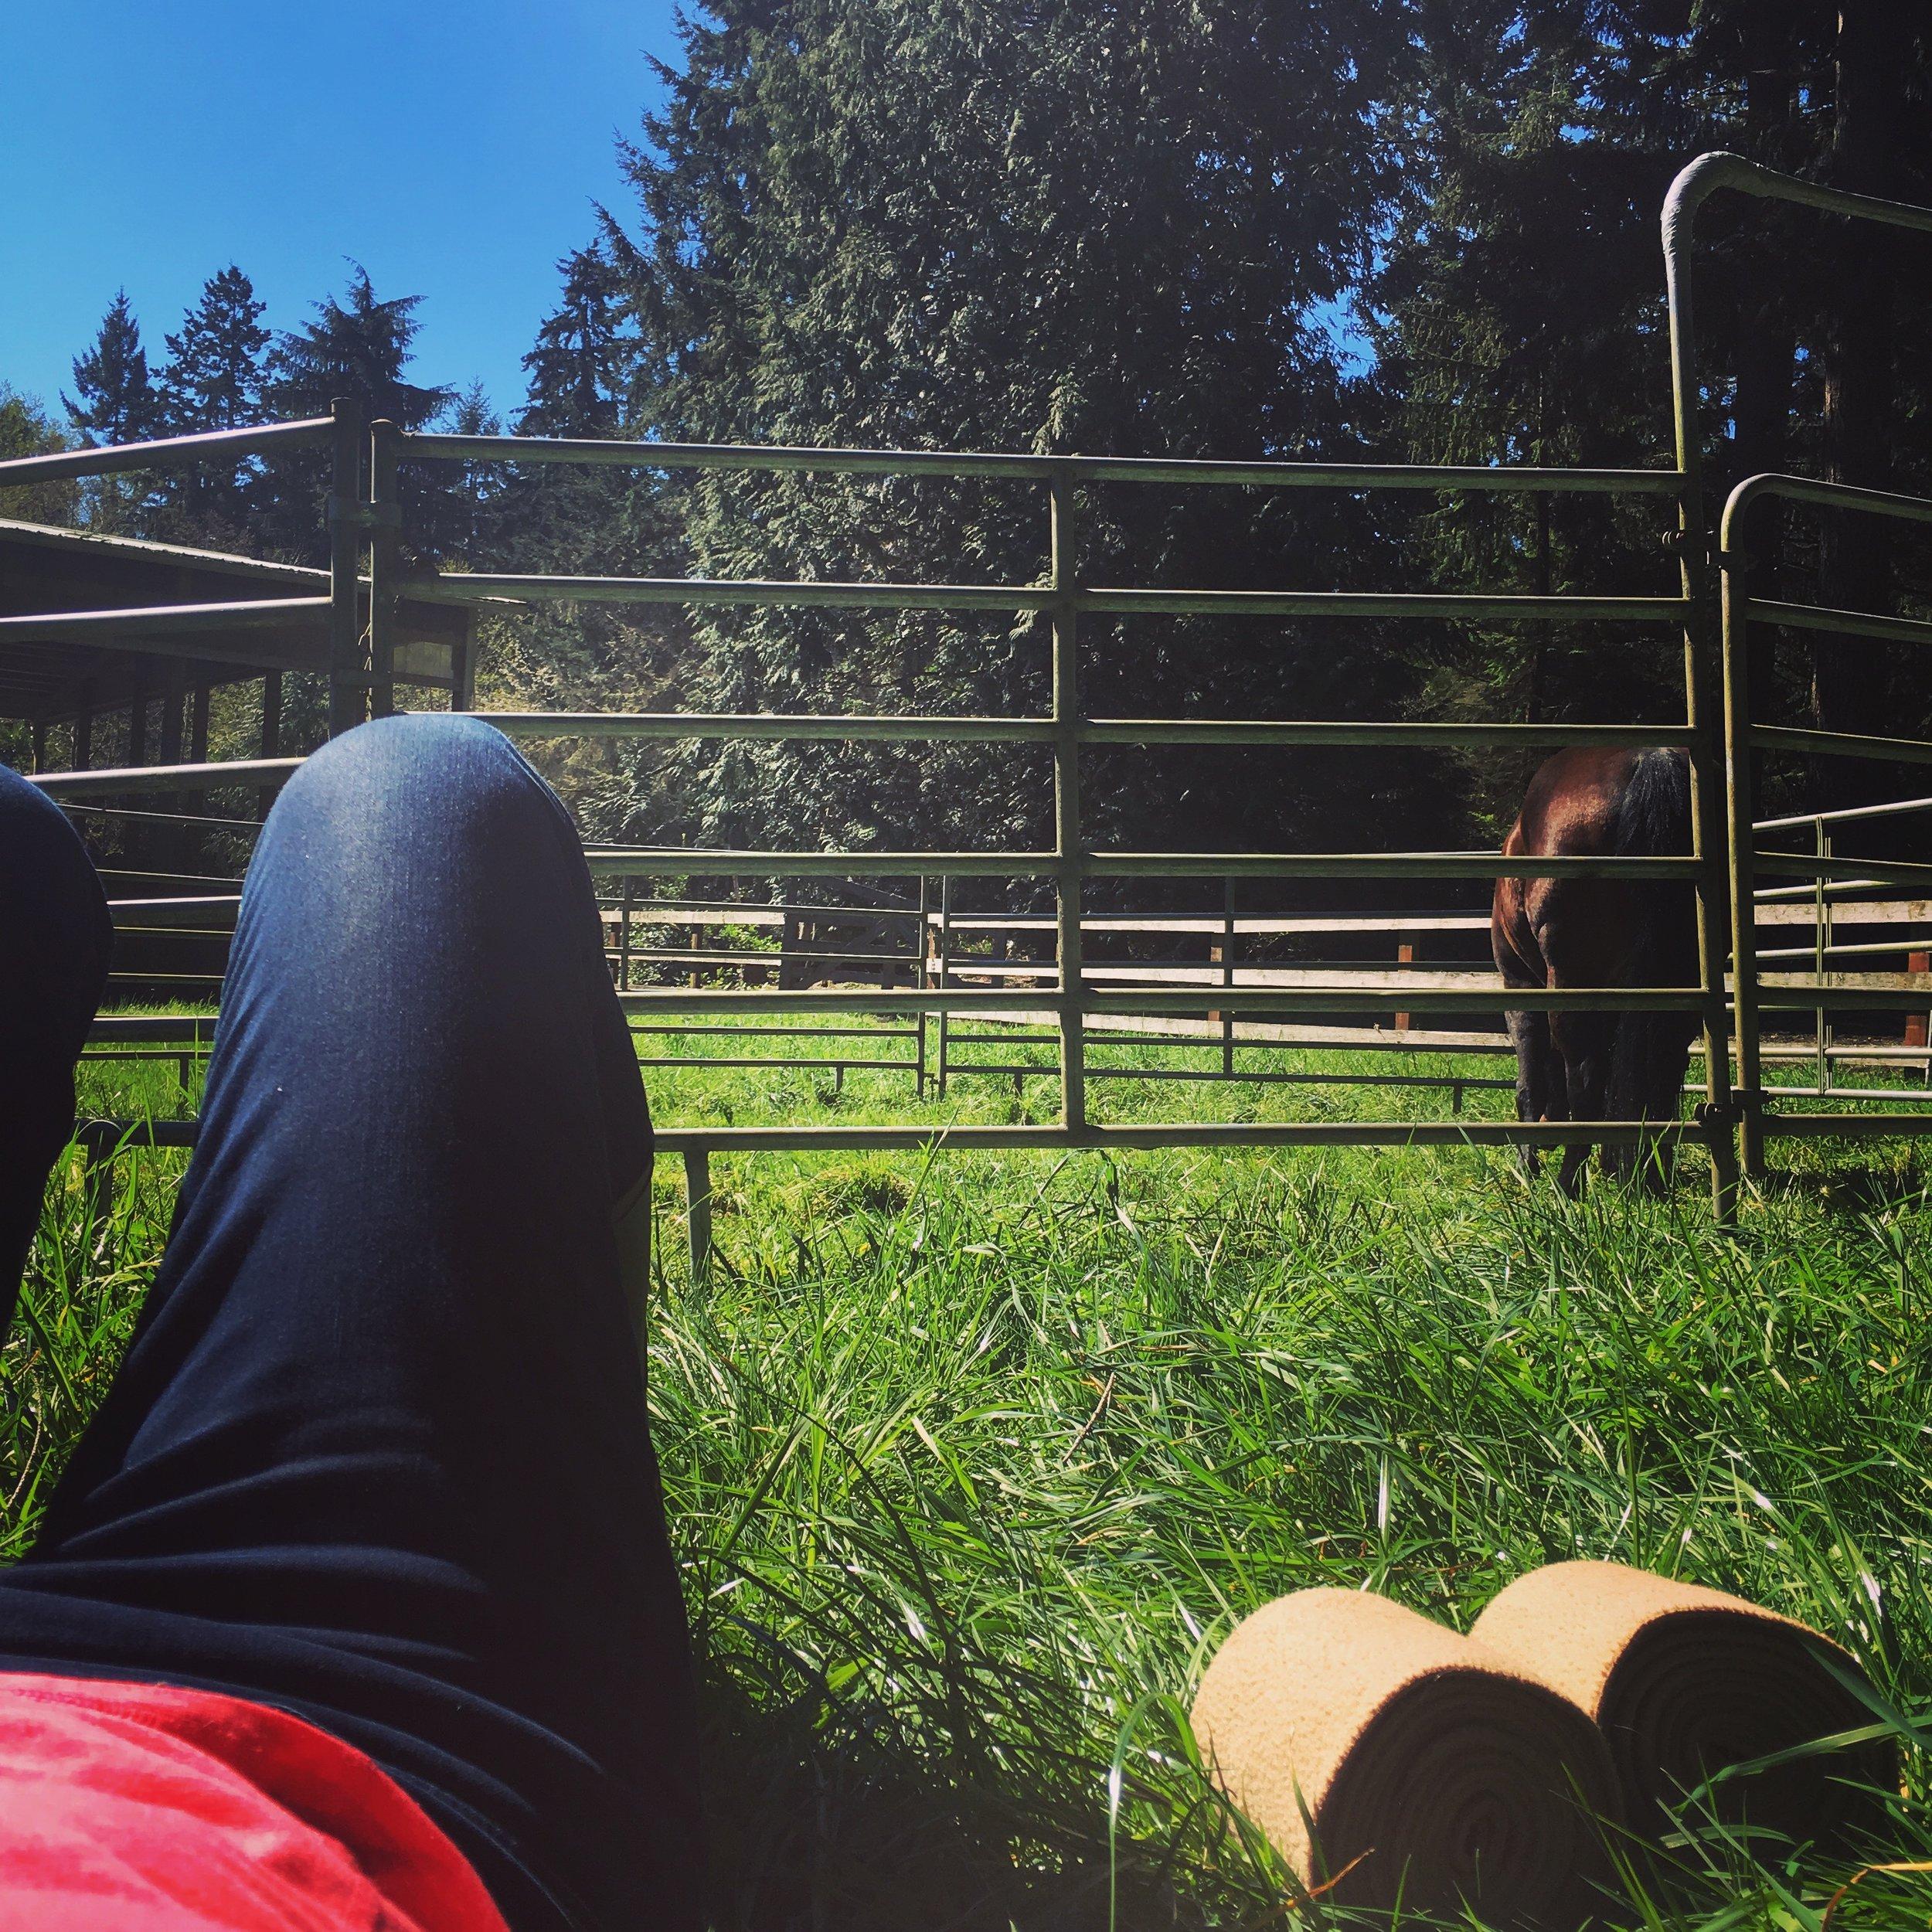 Enjoying the spring sunshine and green grass.